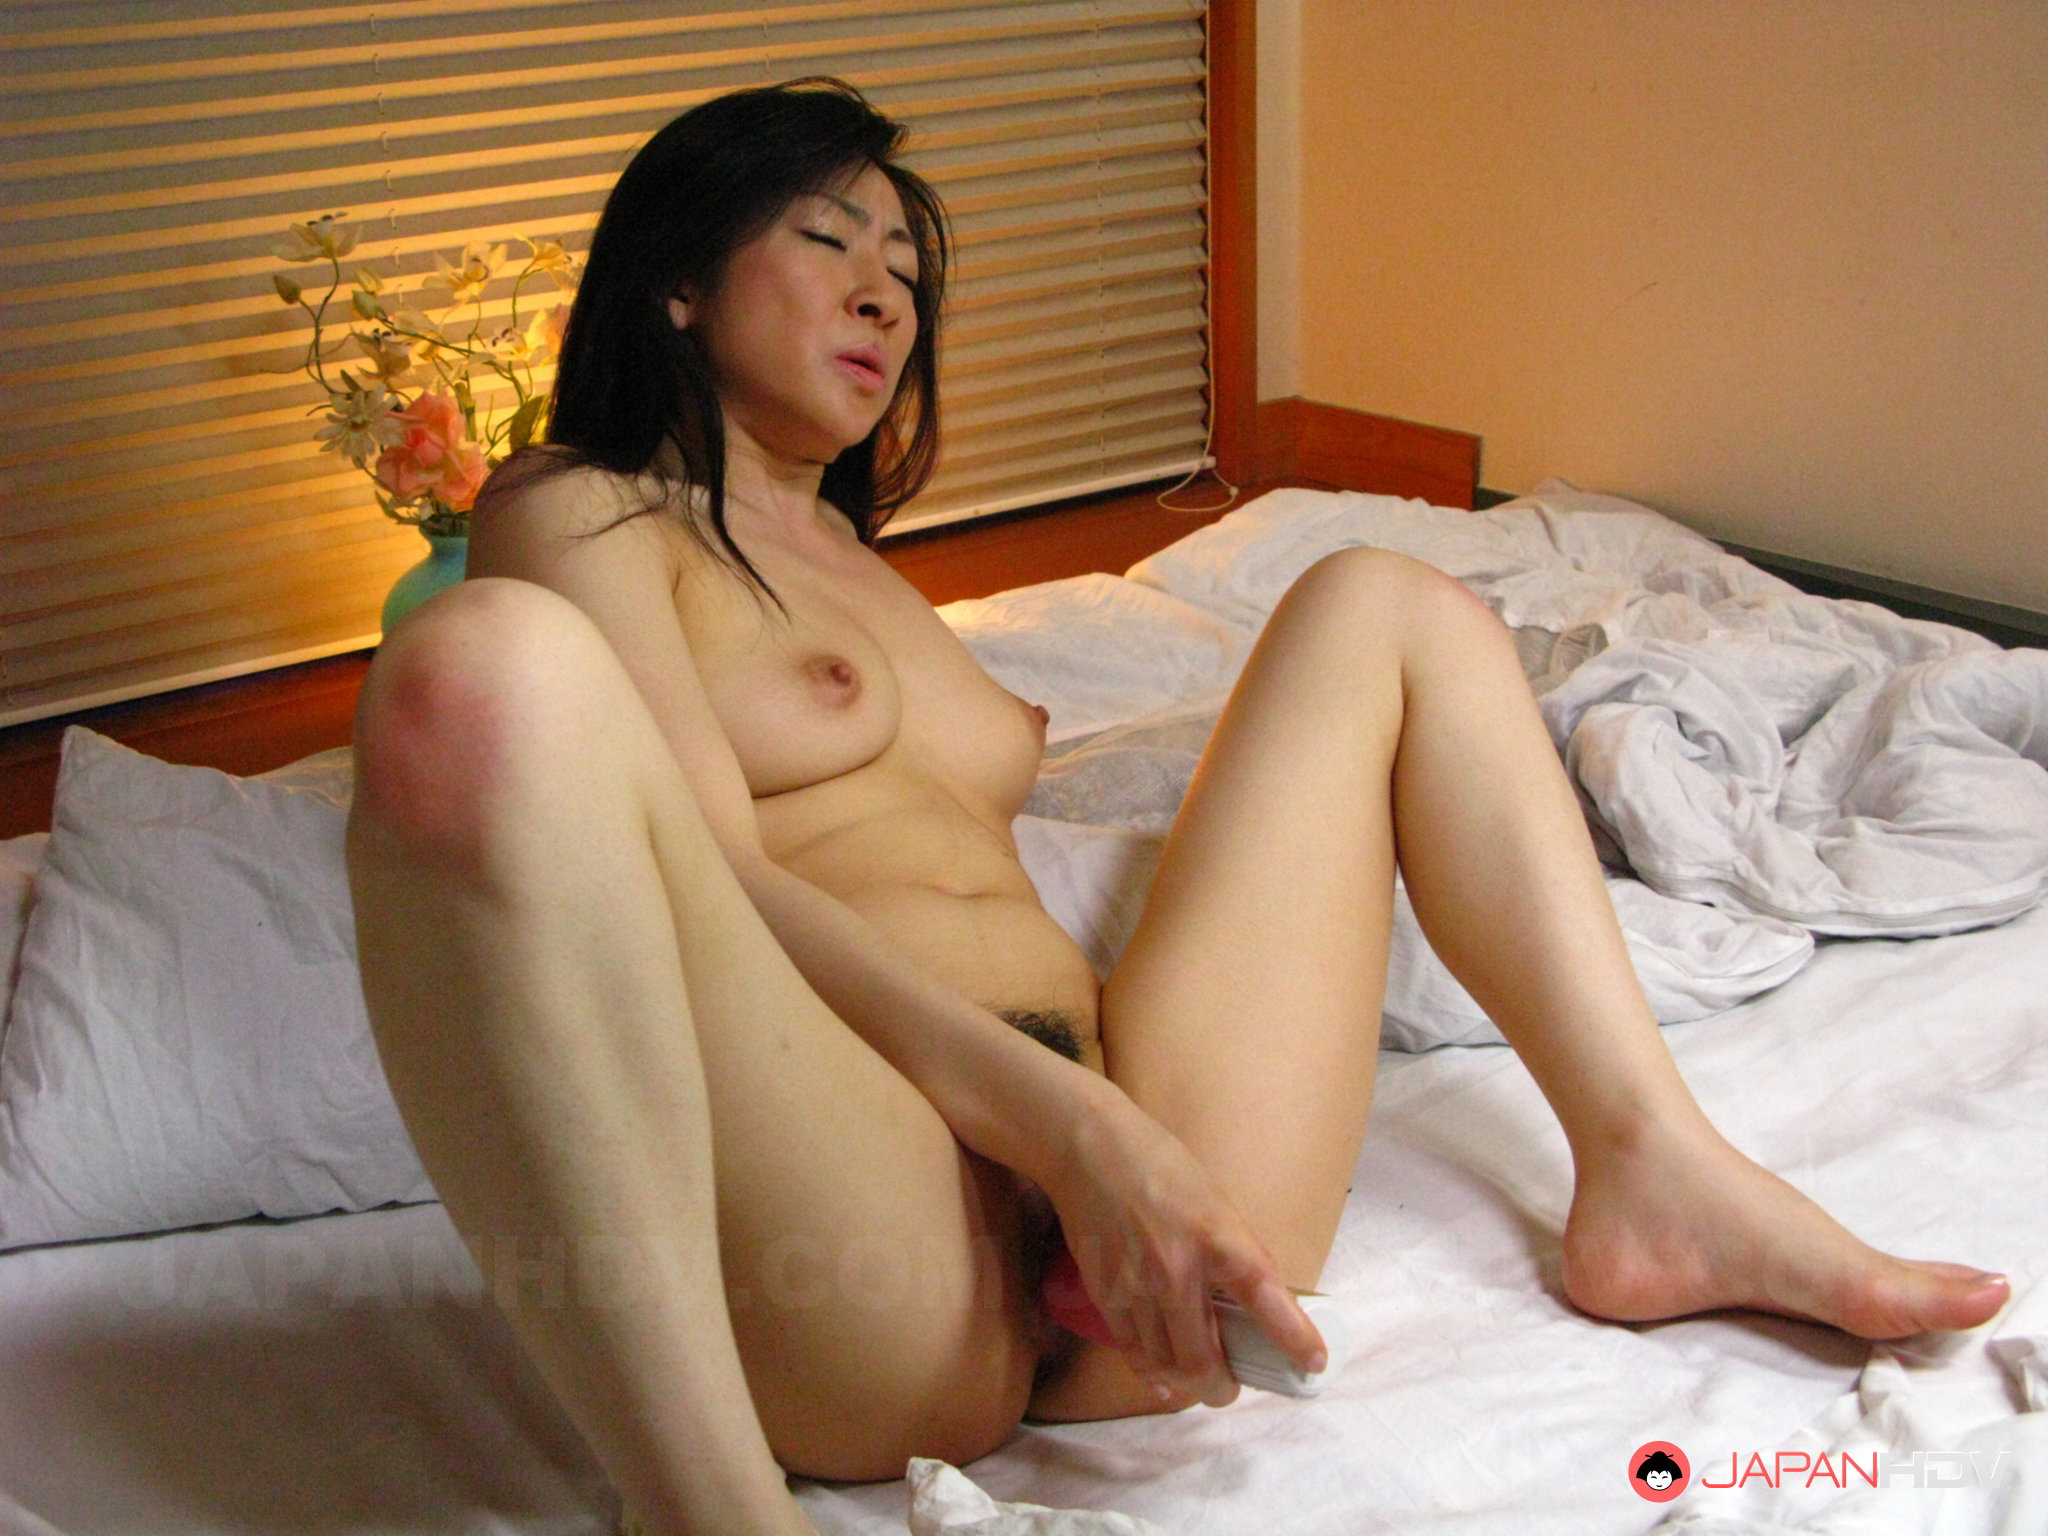 yaponki-skrito-masturbiruyut